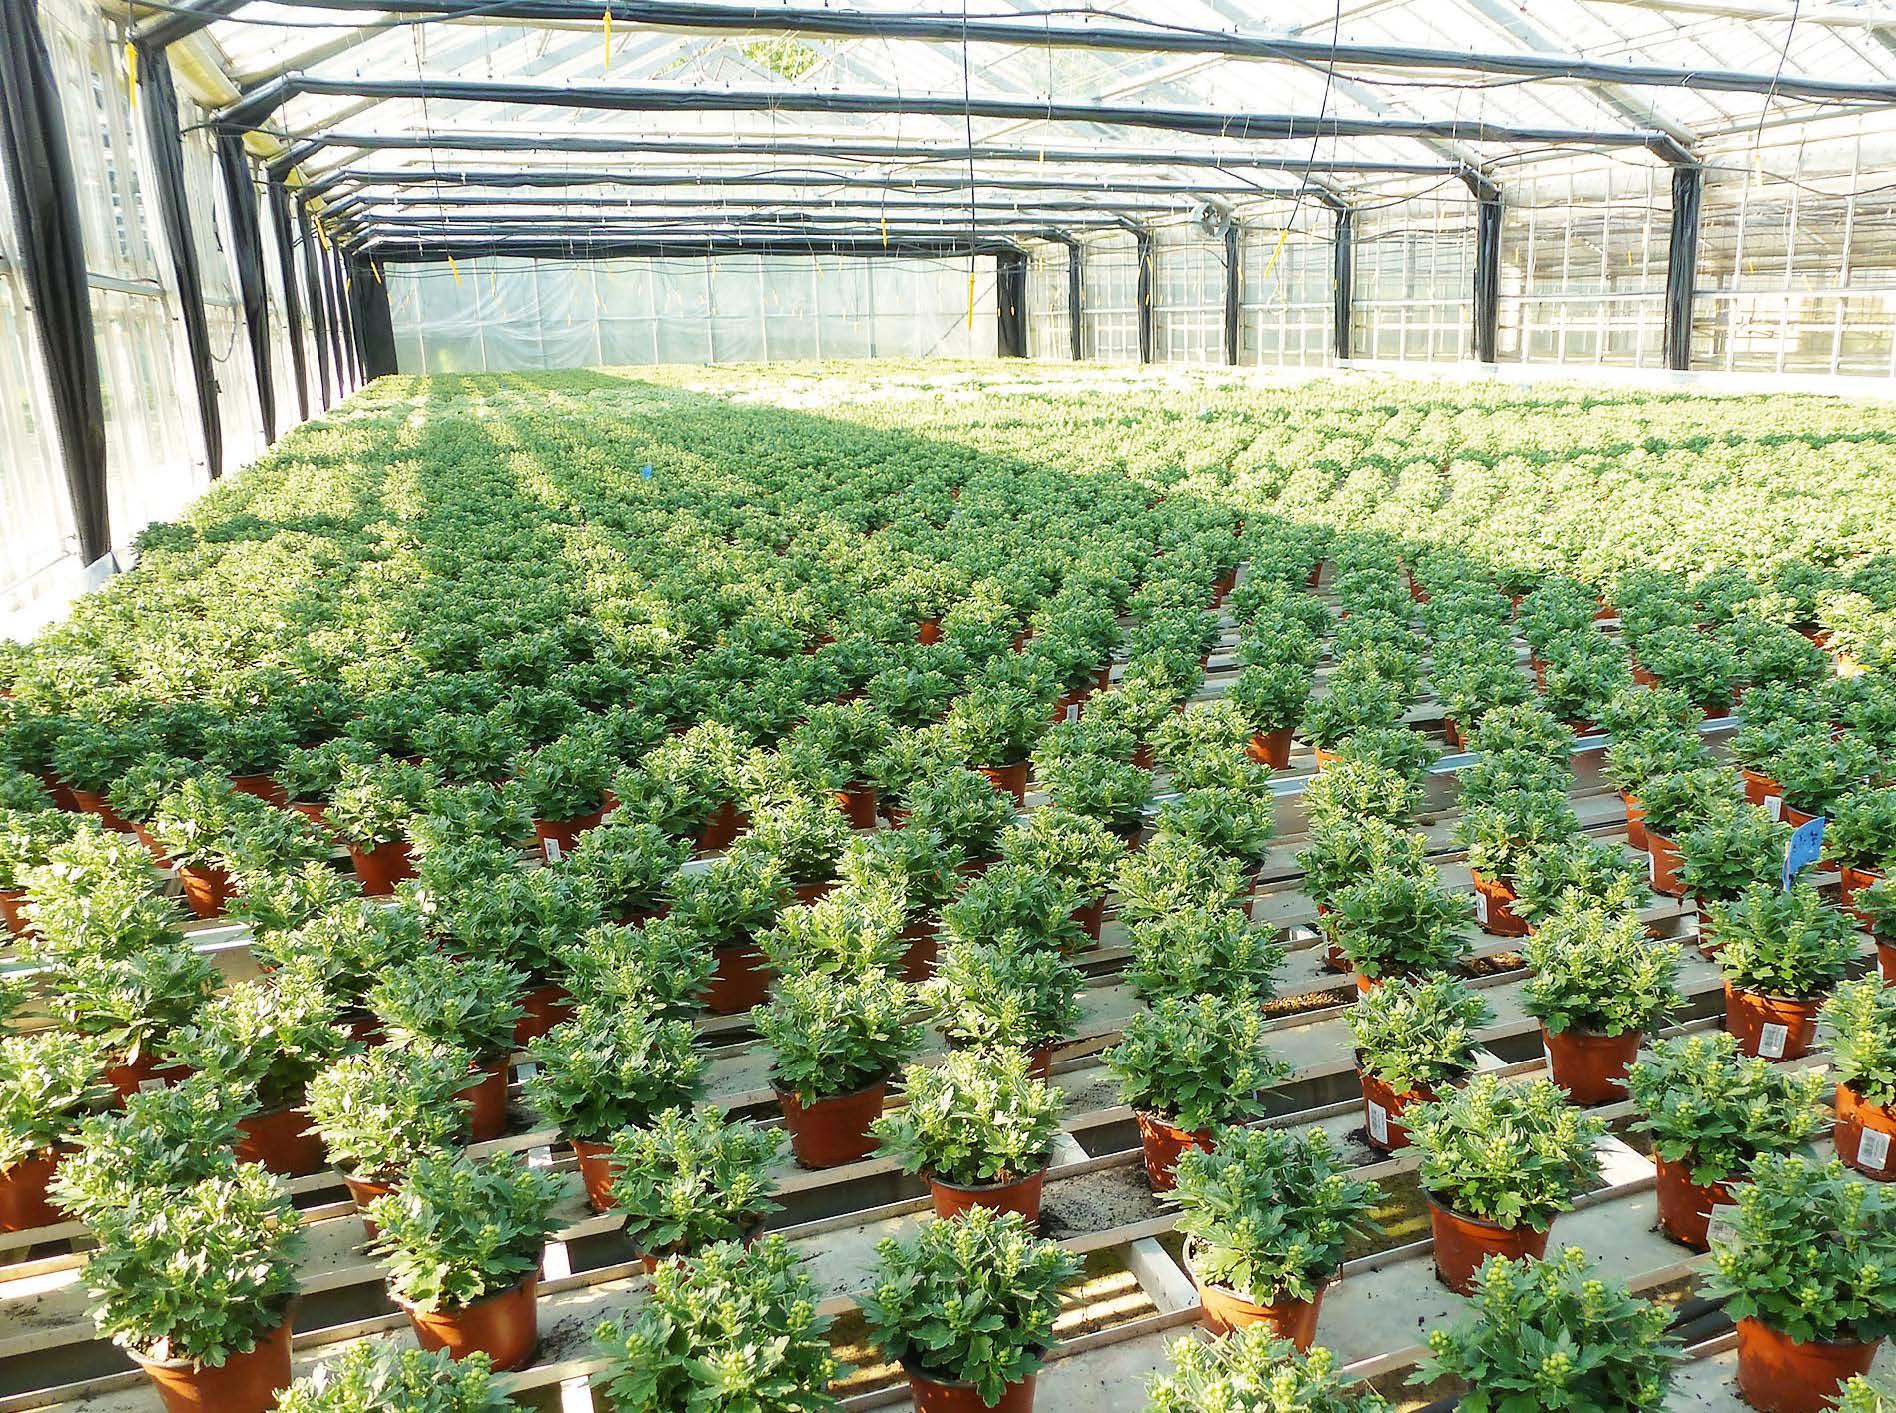 Jungpflanzen mit EM